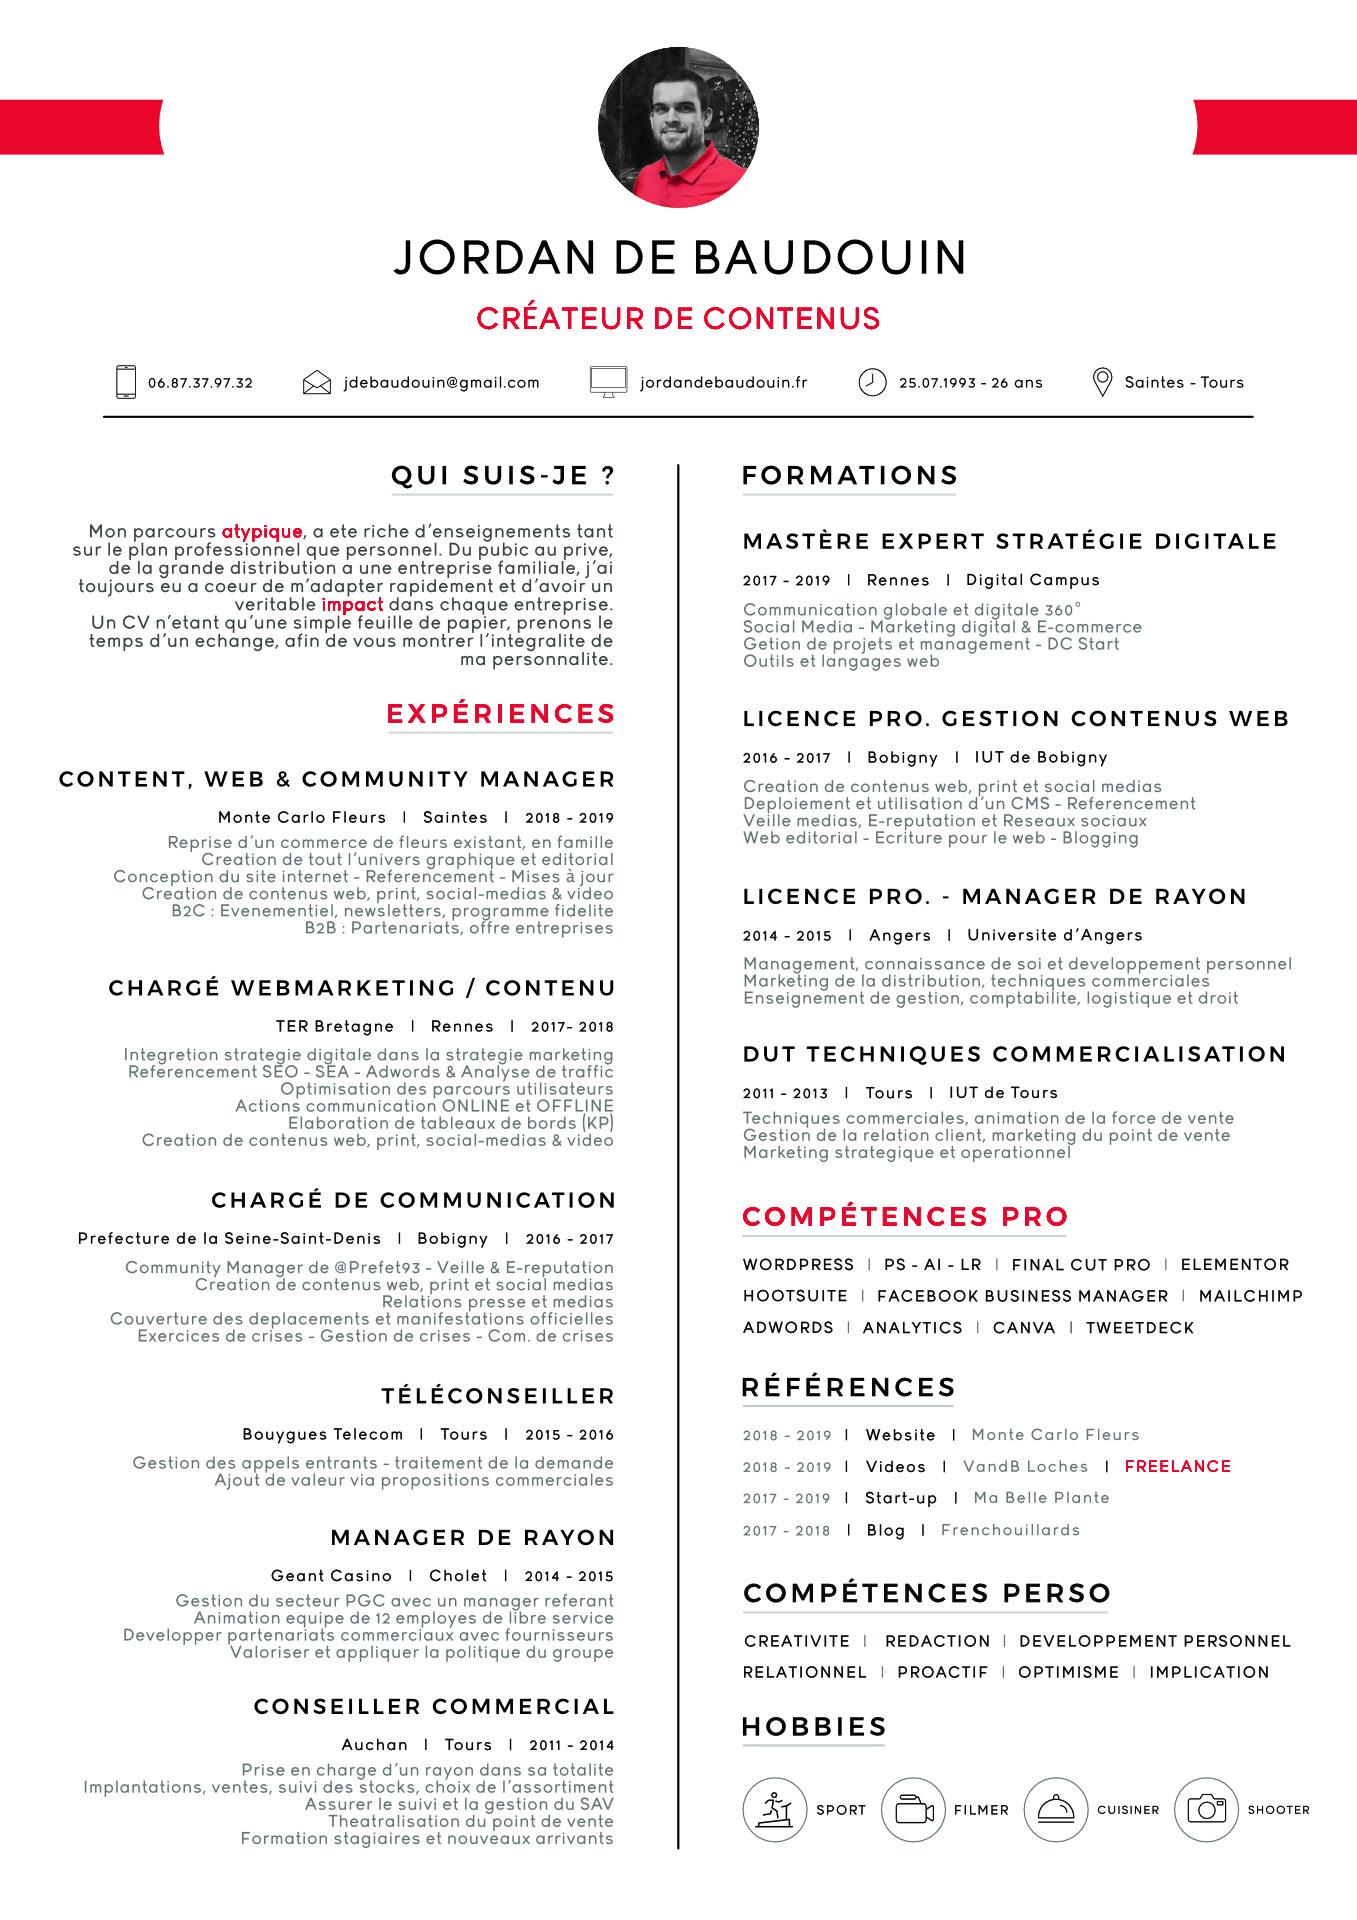 CV de Jordan de Baudouin